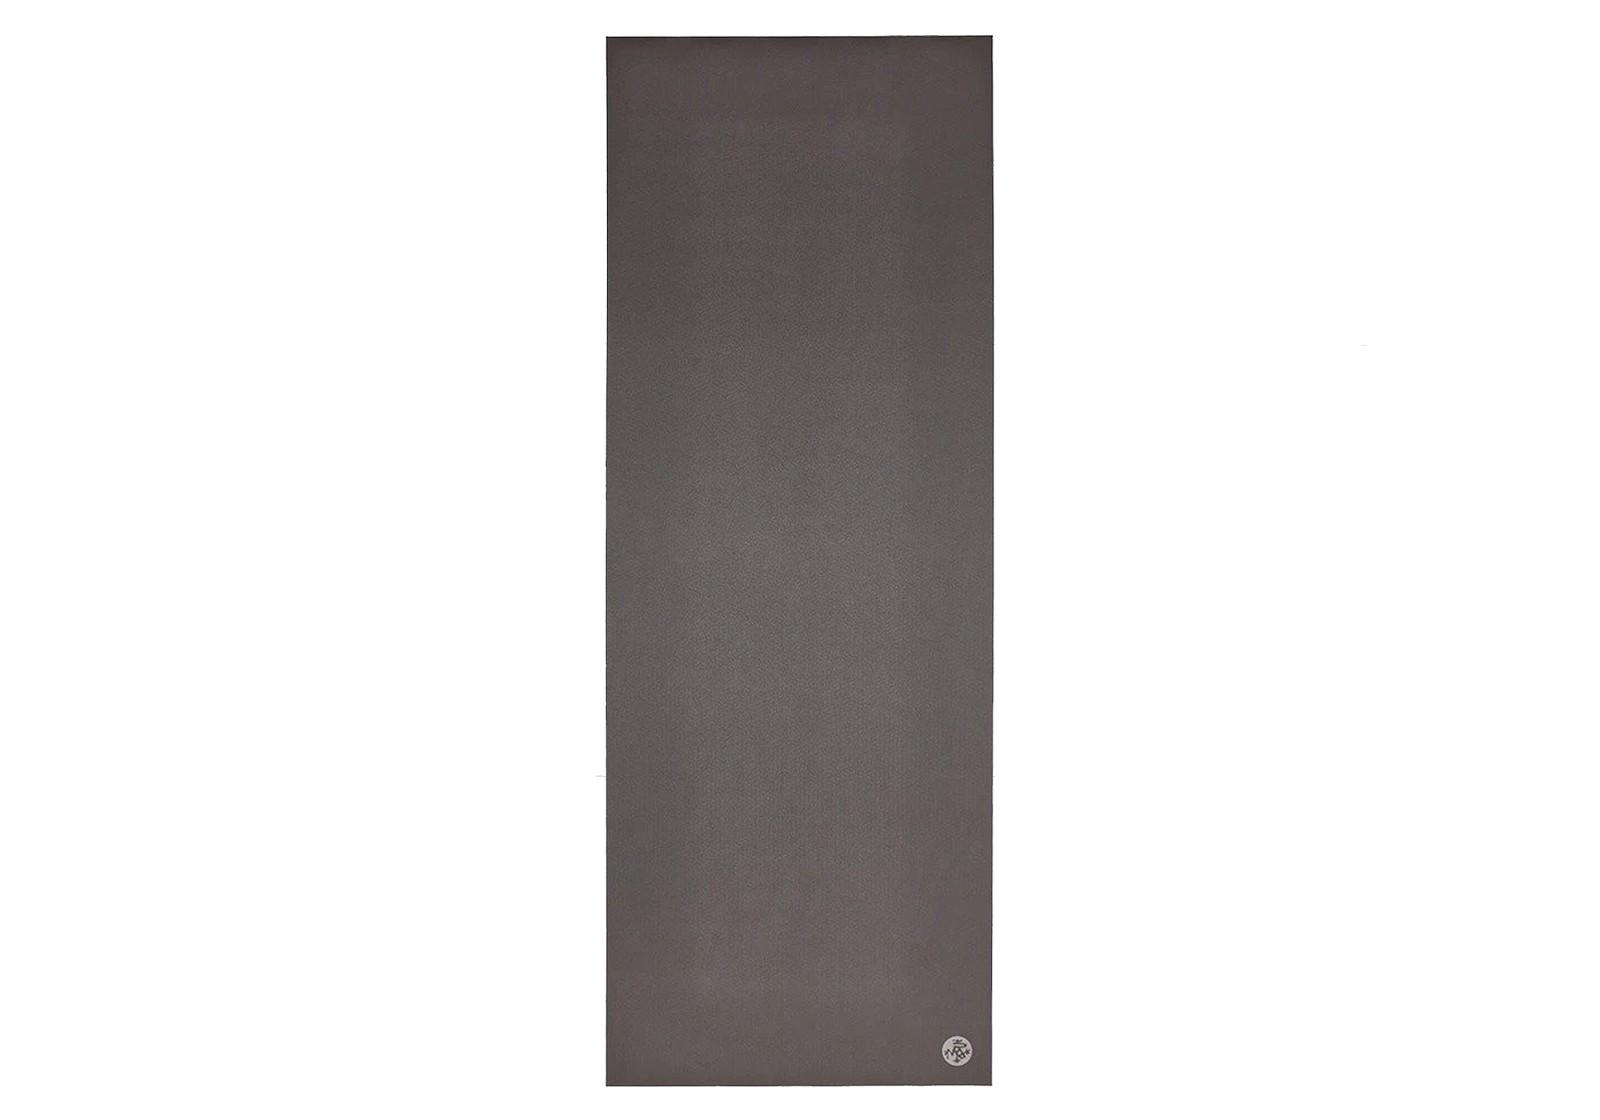 manduka-grp-lite-steel-grey